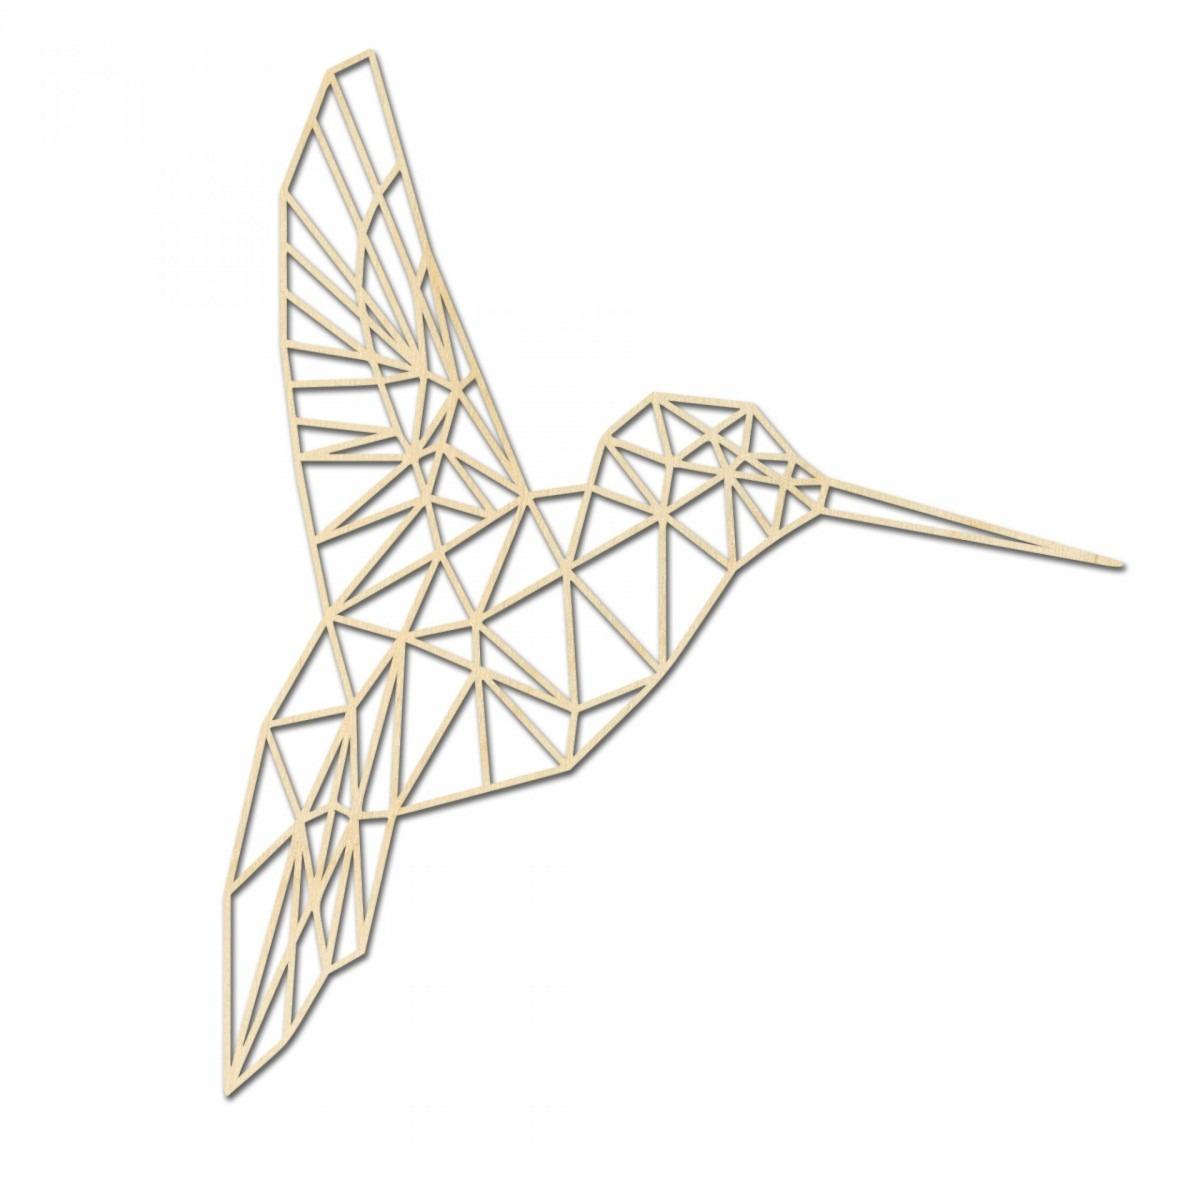 Muurdecoratie kolibrie